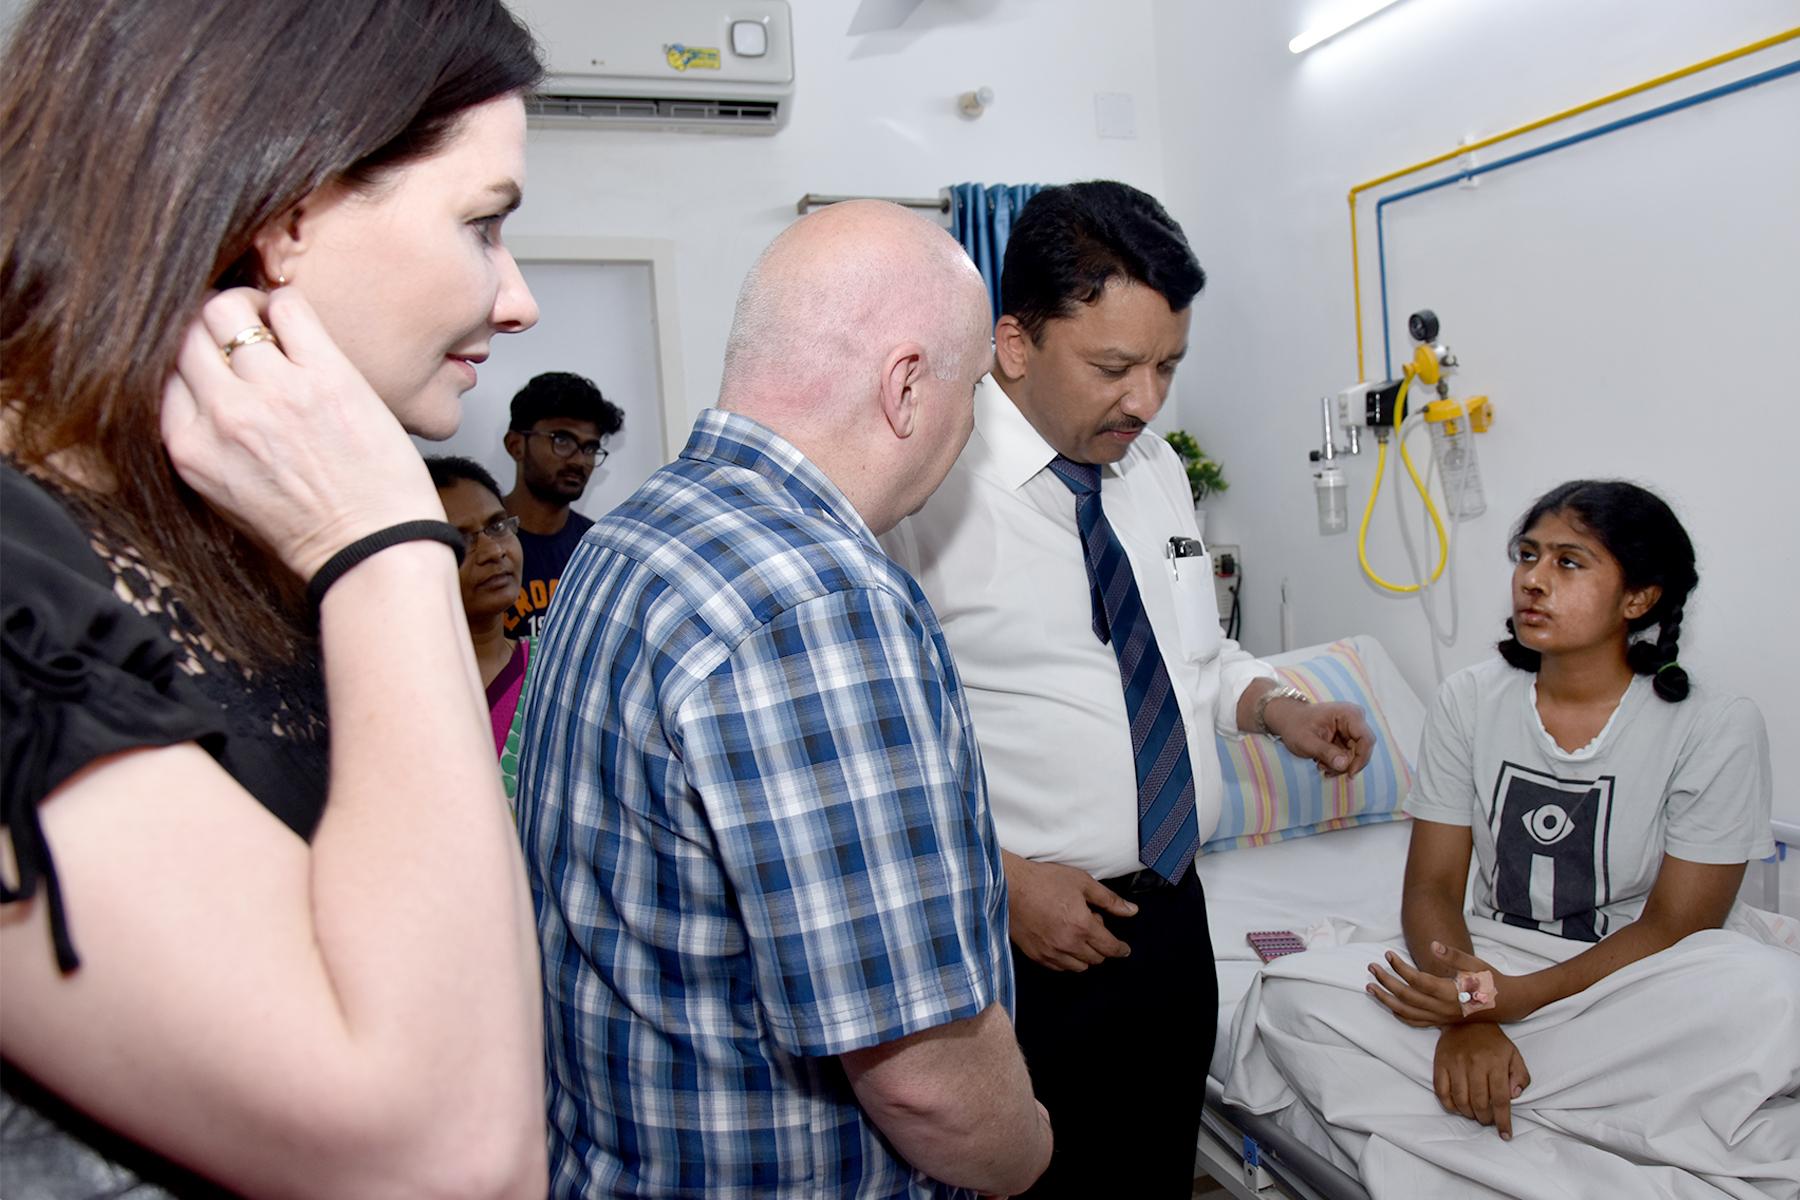 Visitors meet patients